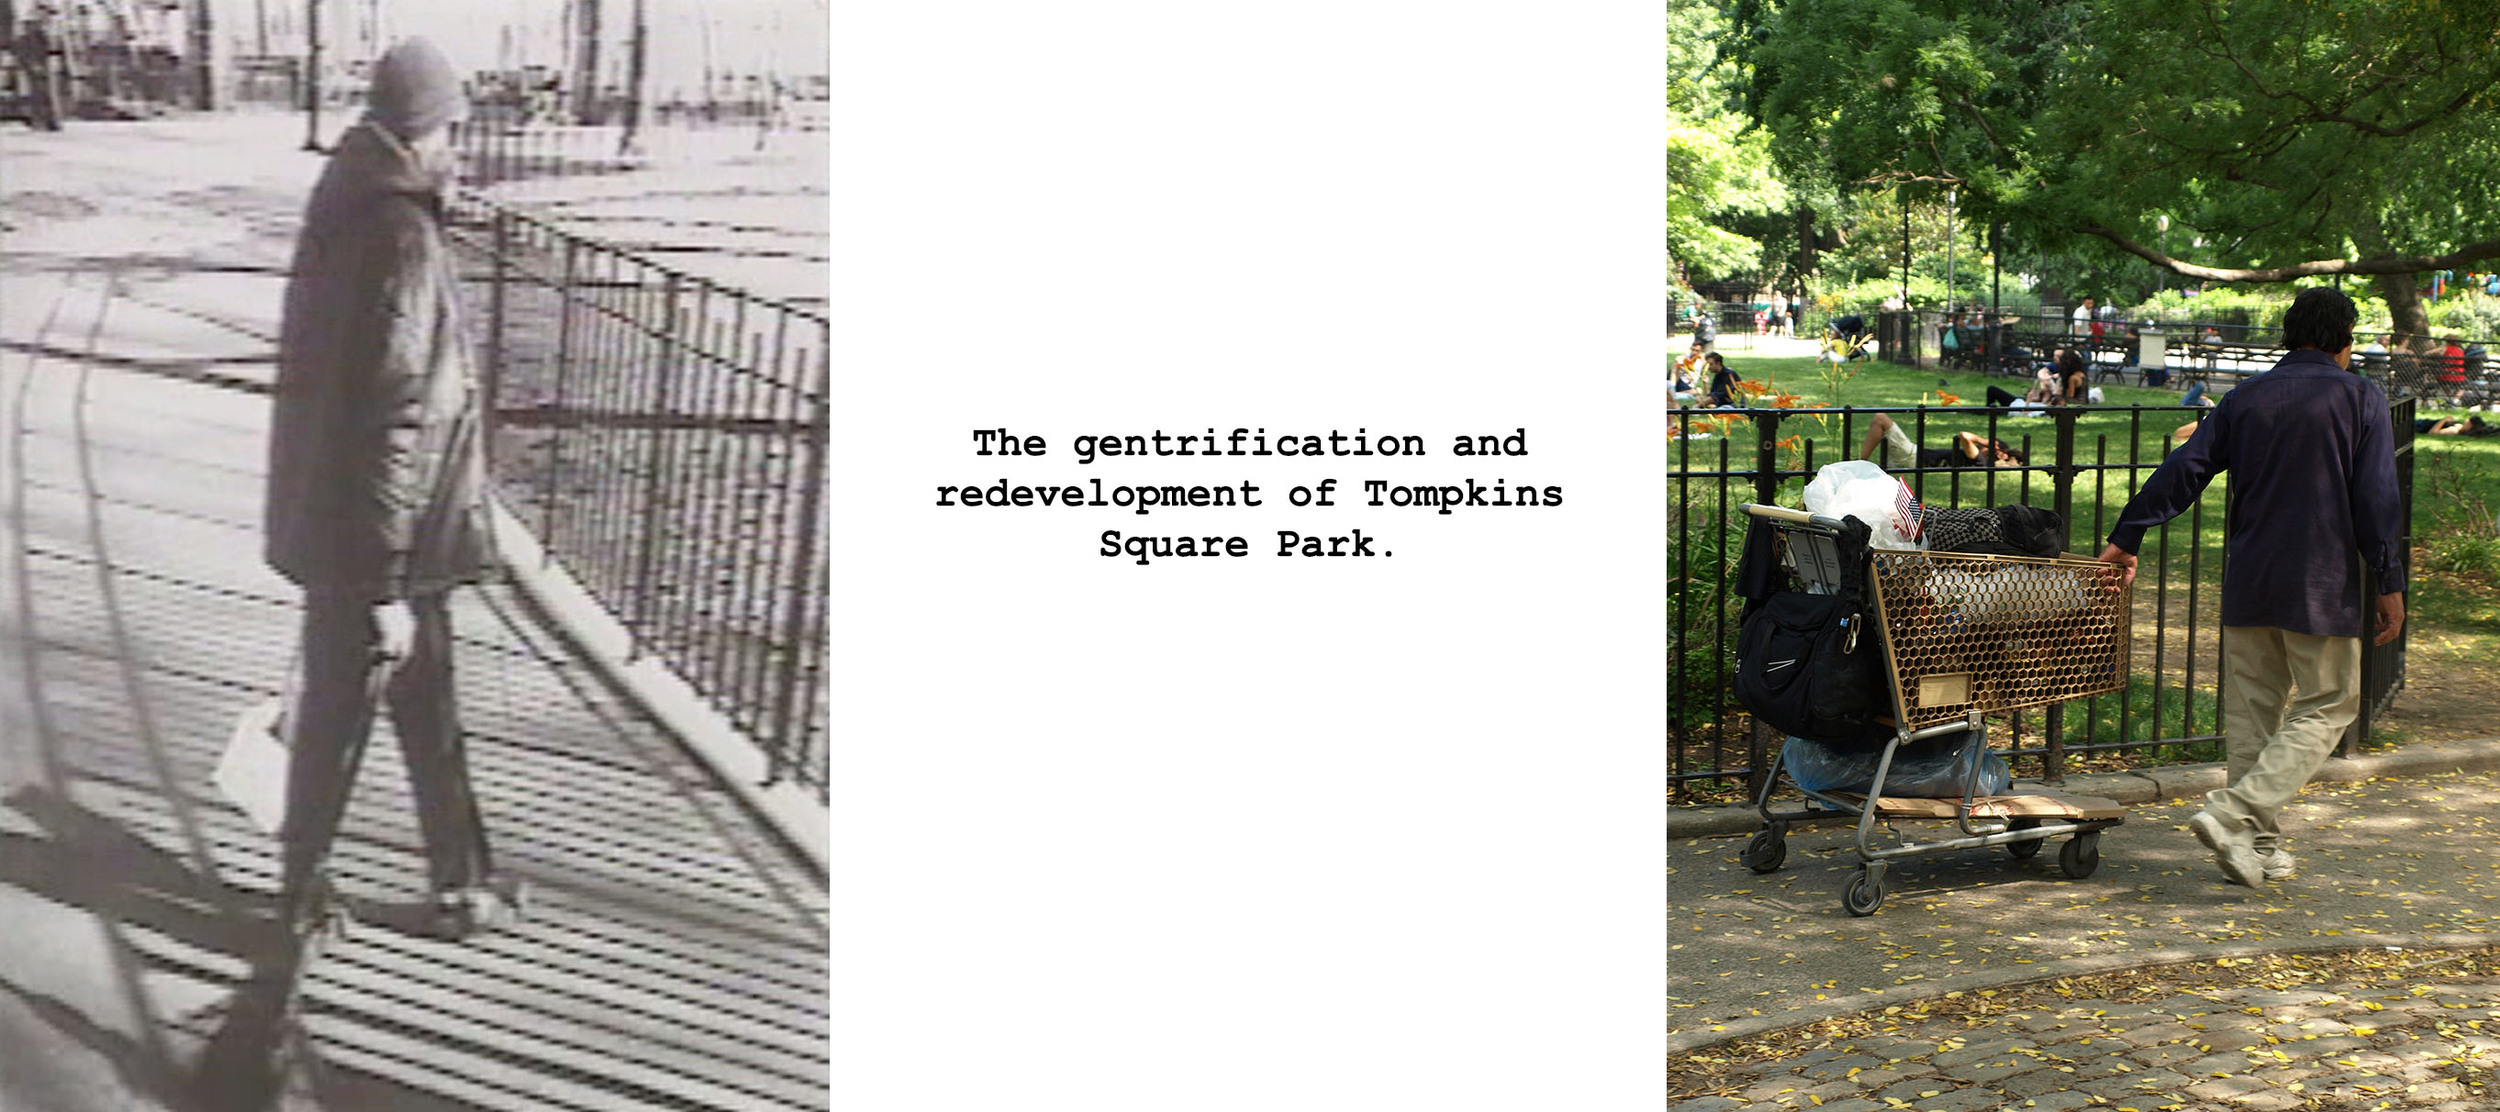 Thompson Square Park.jpg